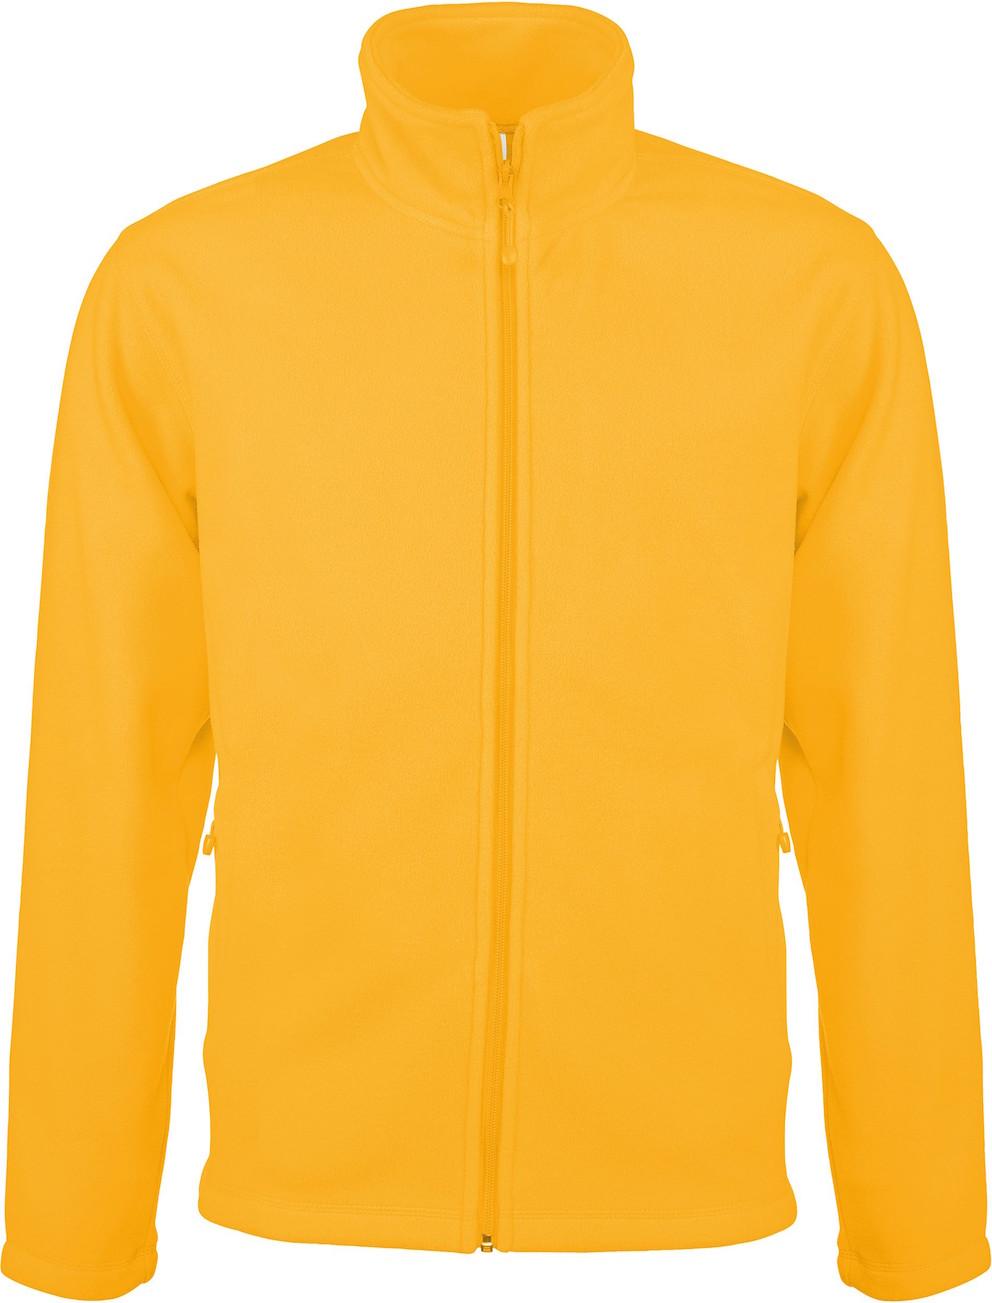 Microfleecetakki K911 Yellow